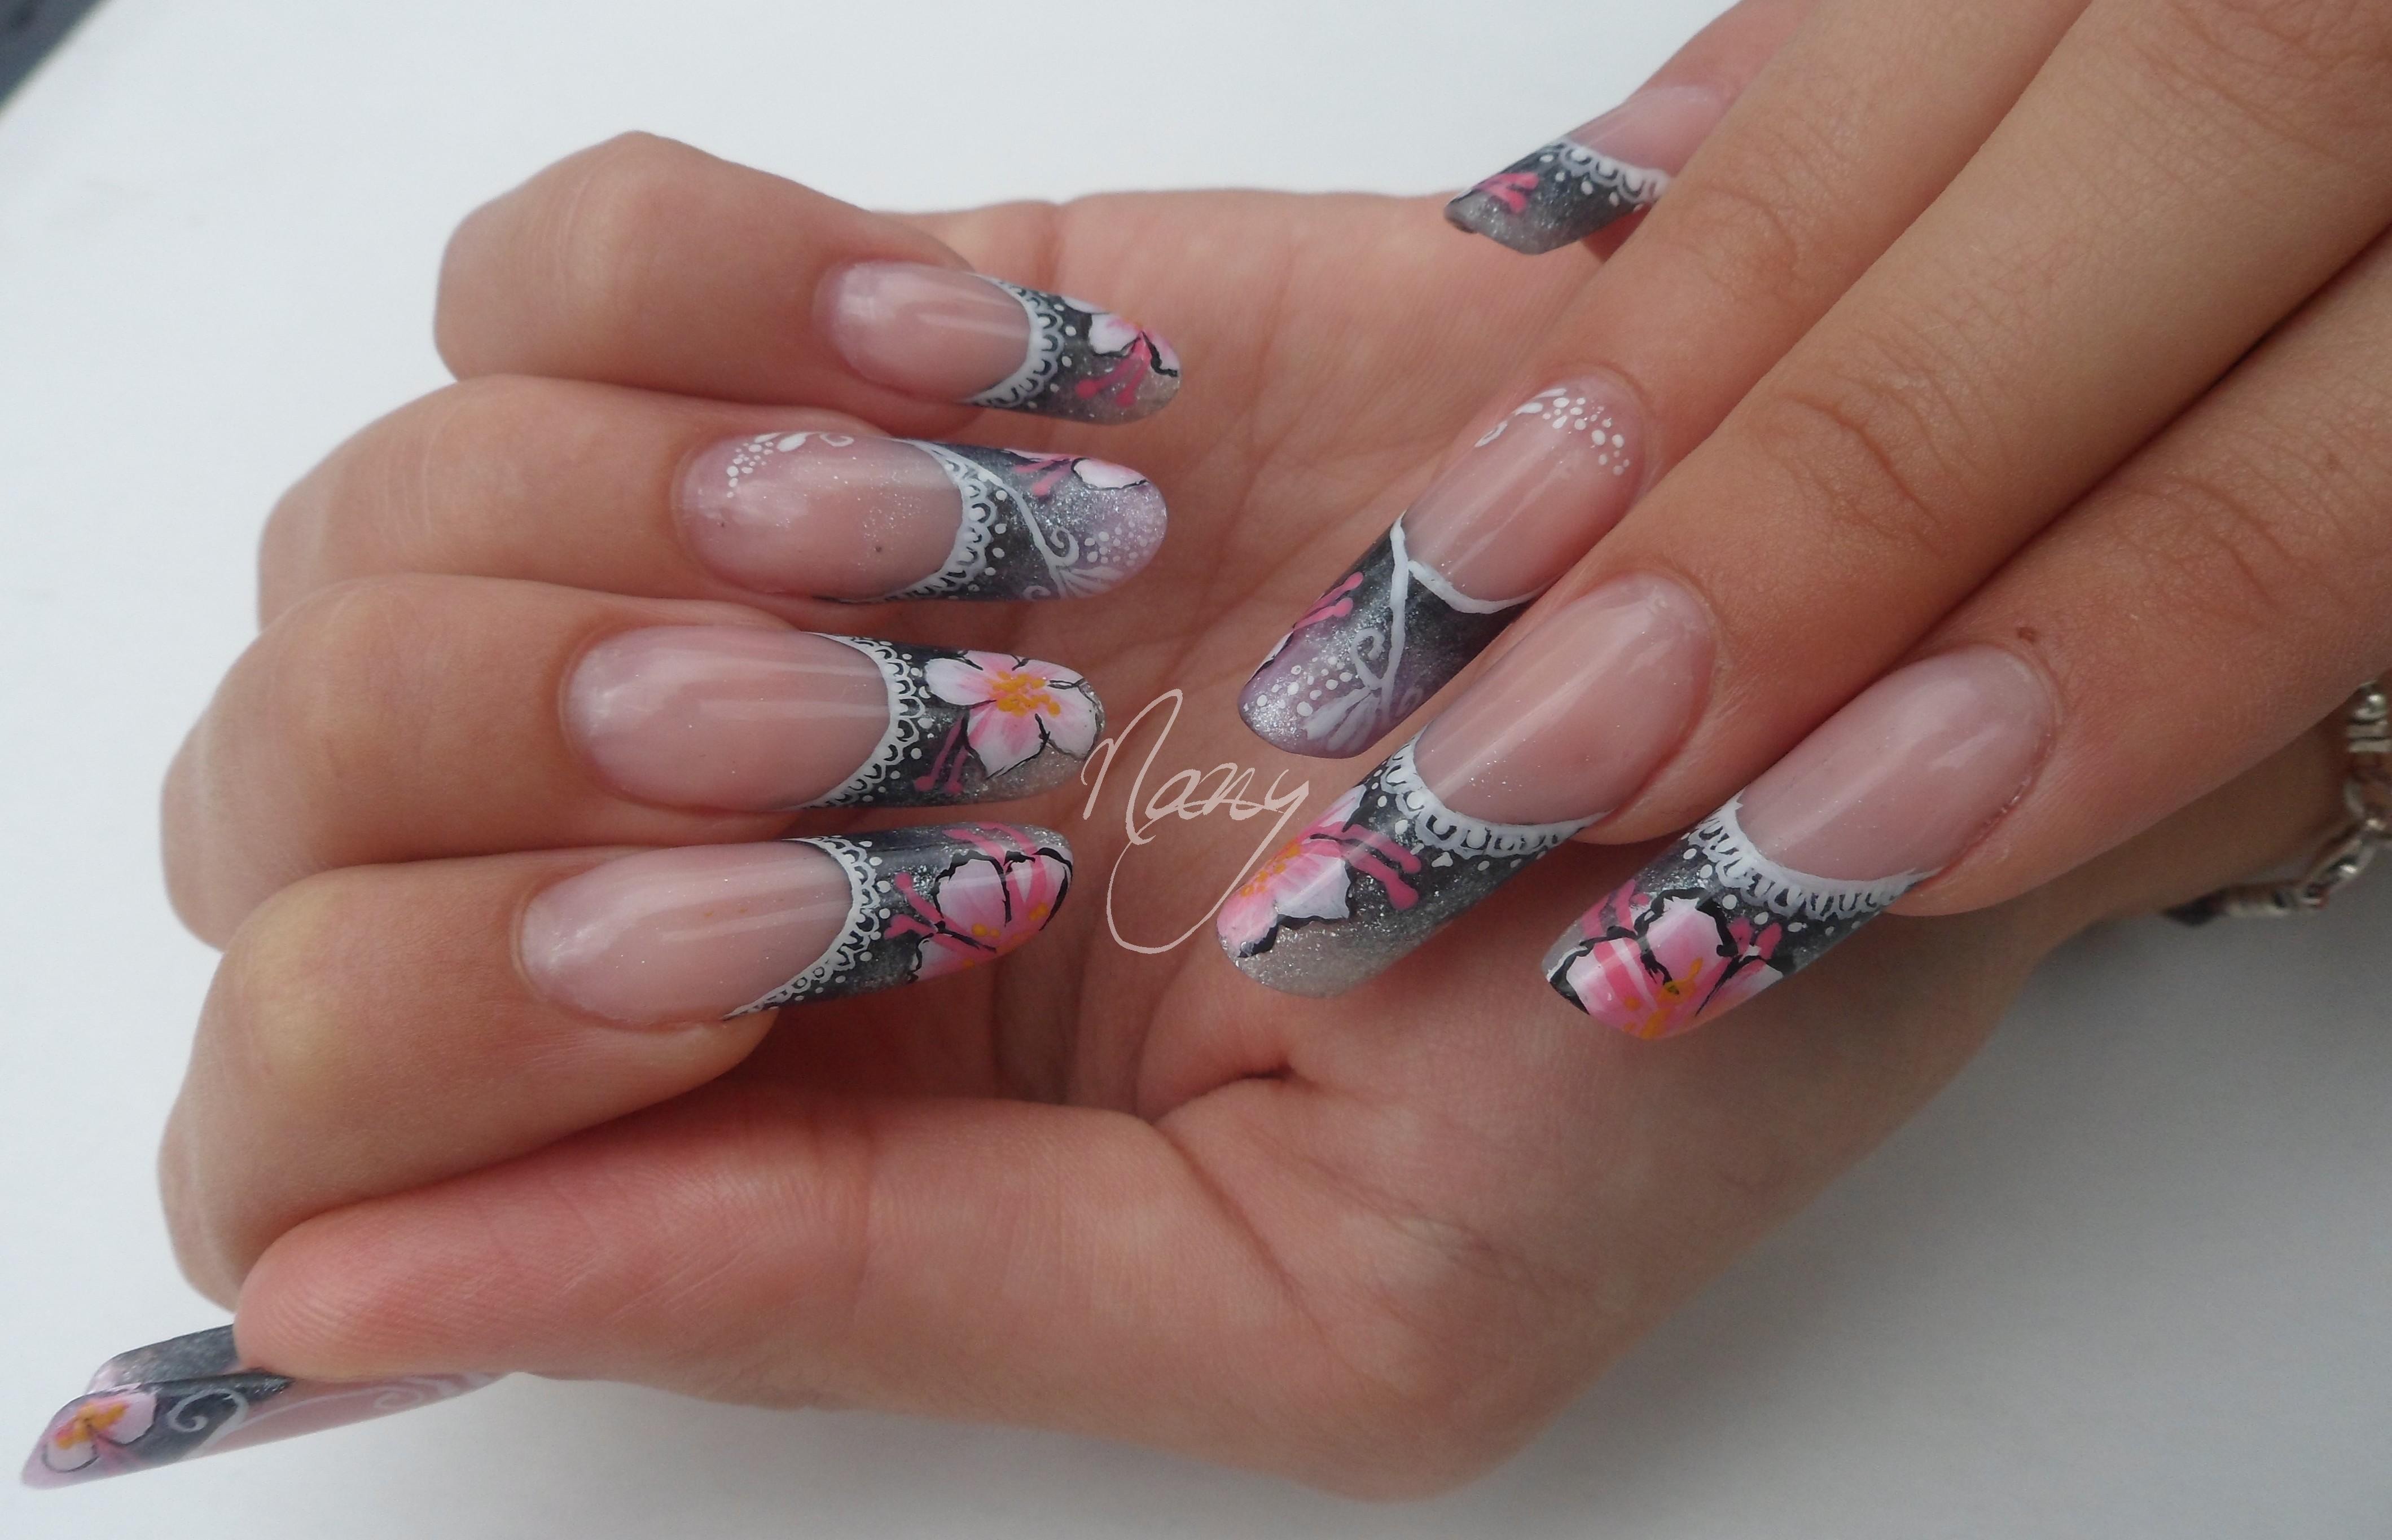 Forme pipe les ongles de nany - Forme des ongles ...